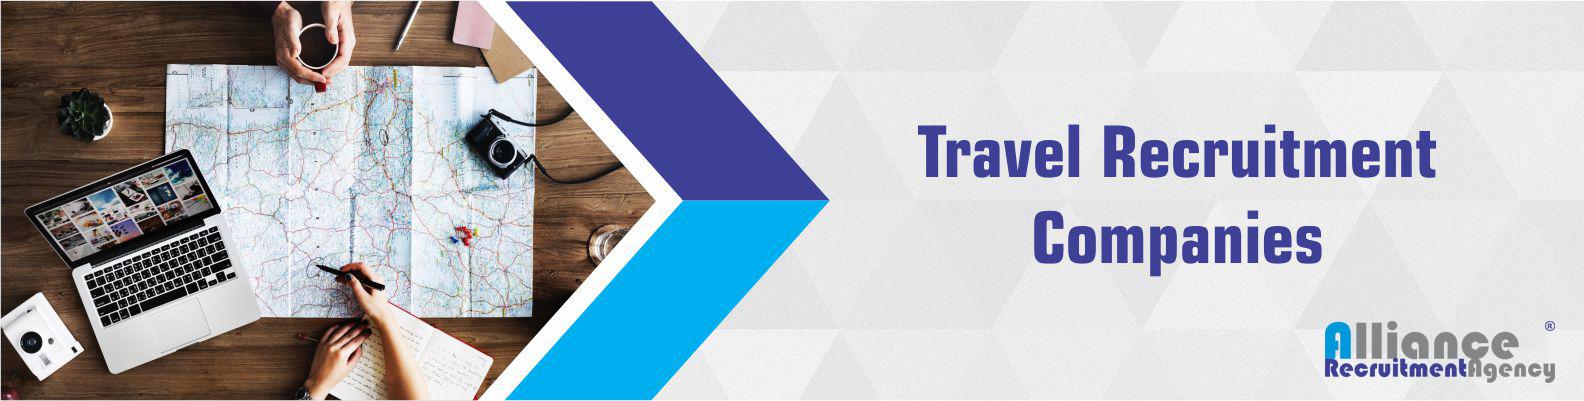 Travel Recruitment Companies